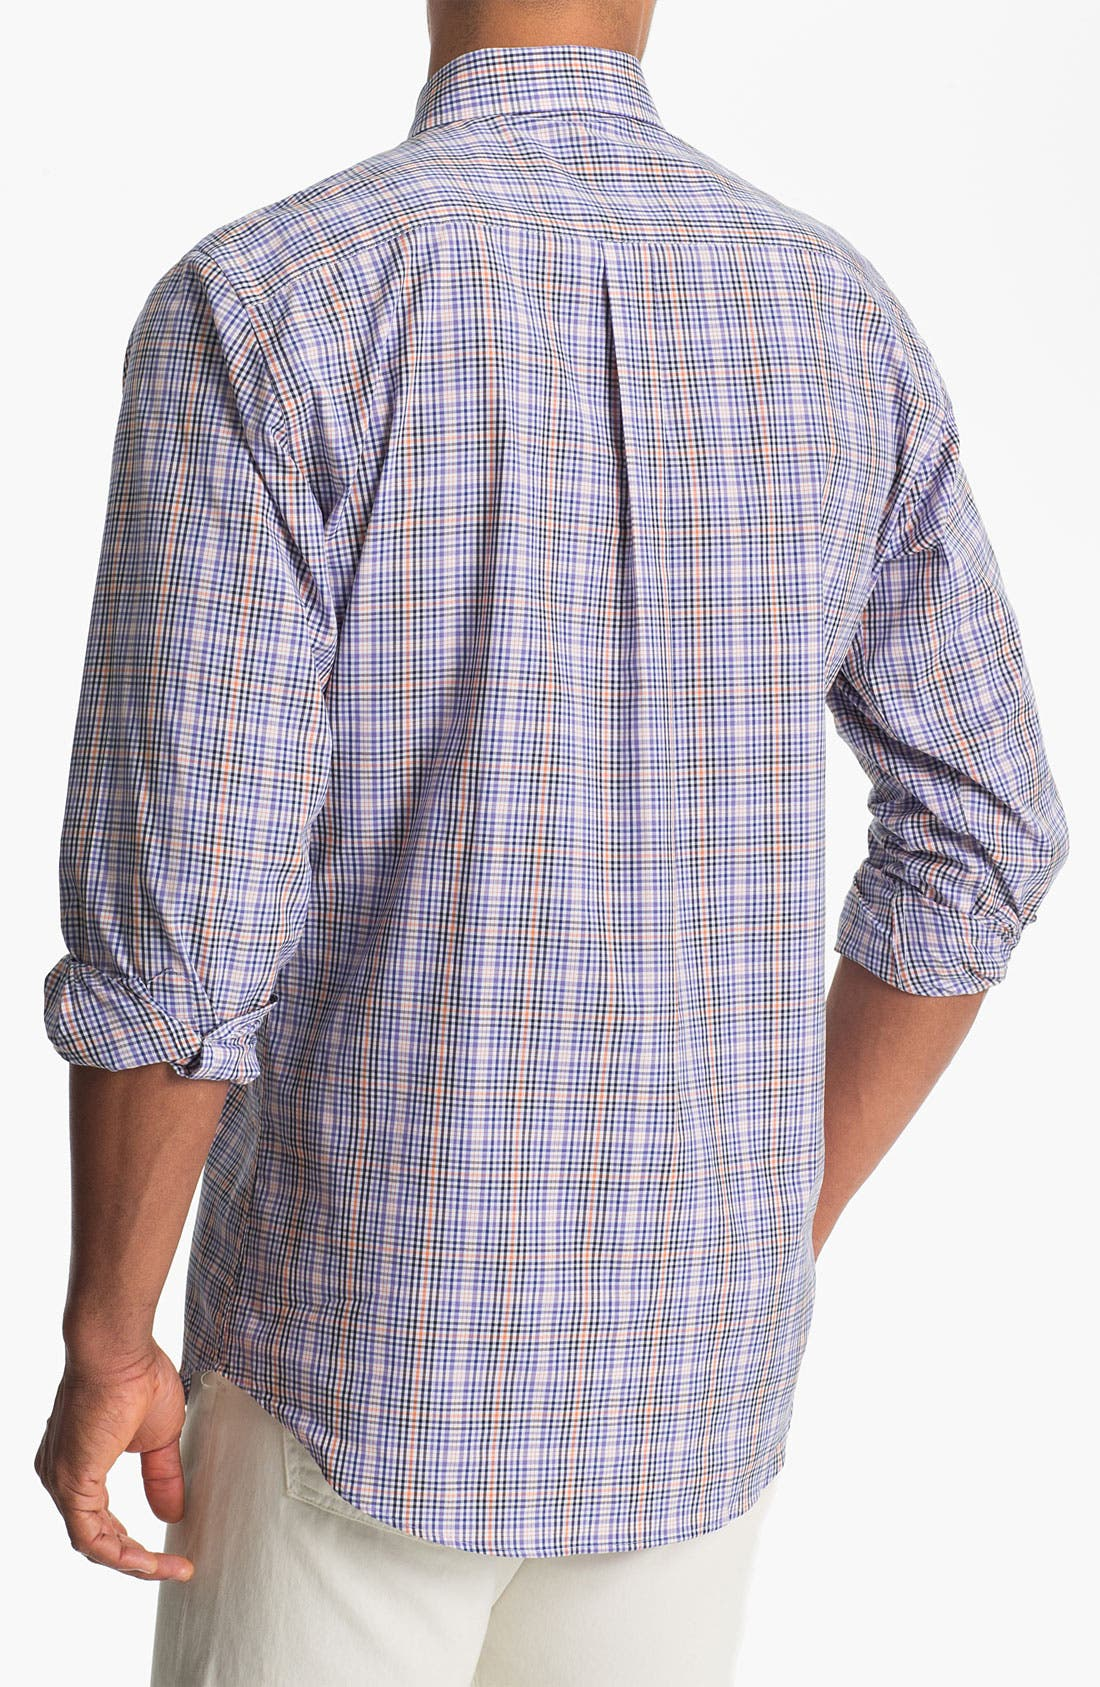 Alternate Image 2  - Peter Millar Sport Shirt (Tall)